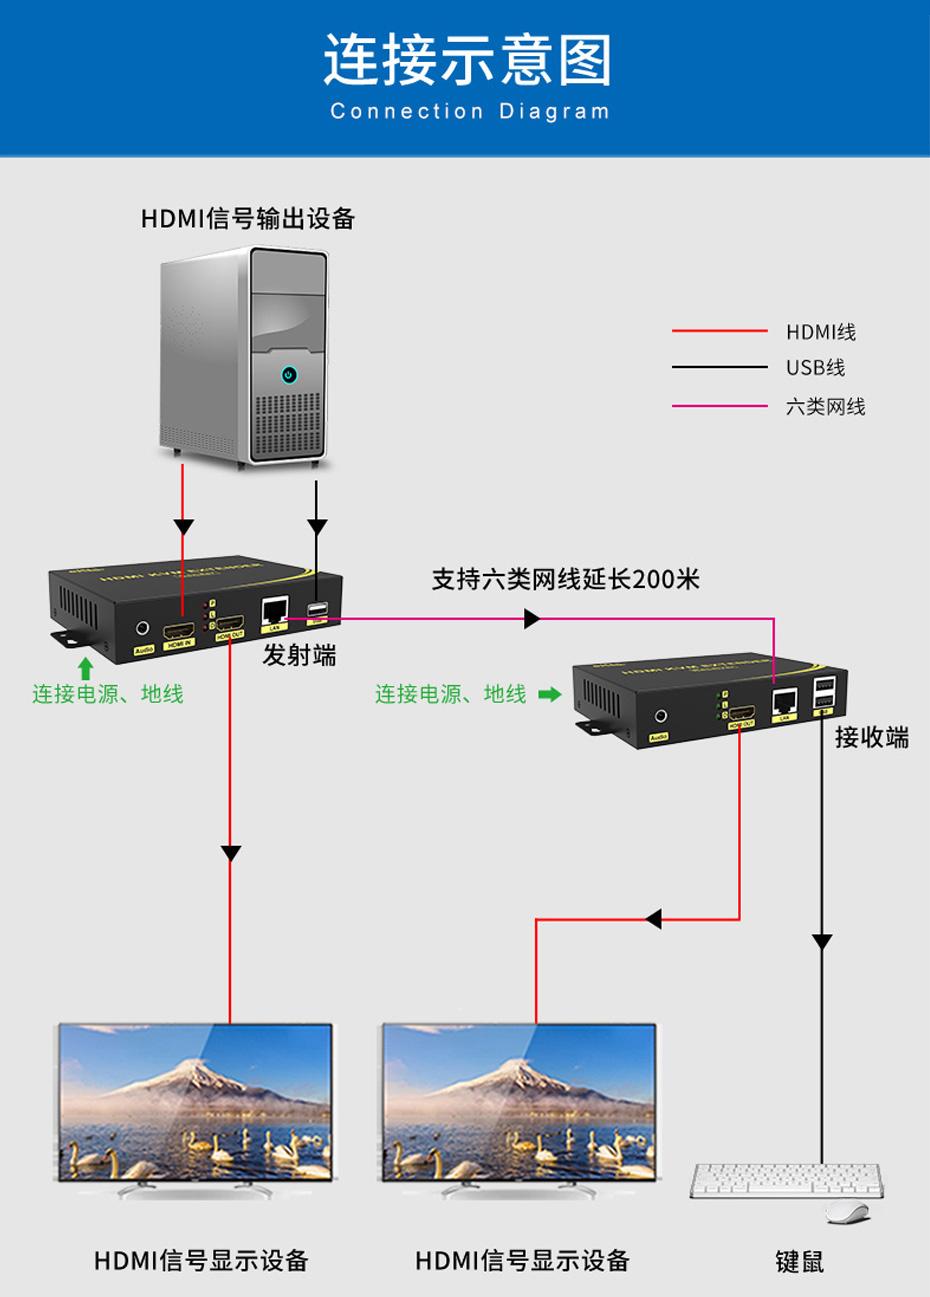 HDMI KVM网络延长器HKU200连接使用示意图